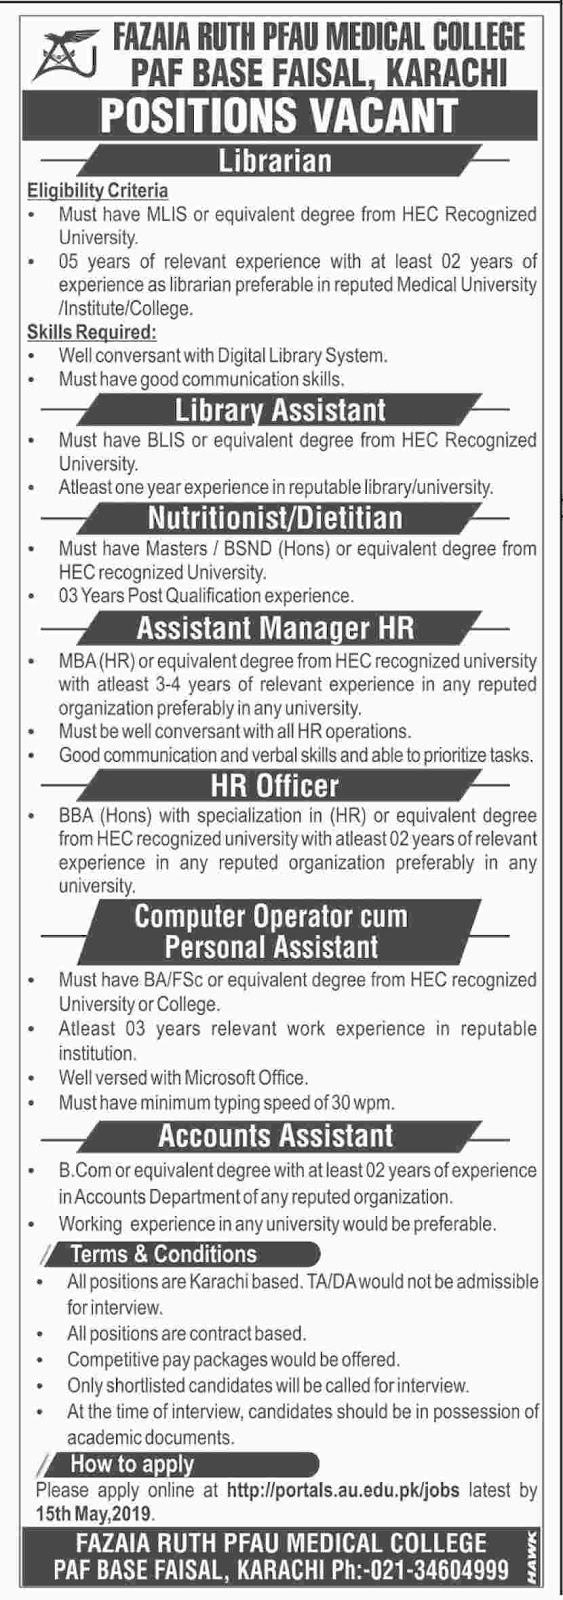 ➨ #Jobs - #Career_Opportunities - #Jobs -  Fazaia RUTH PFAU Medical College – PAF Base Faisal, Karachi–for application visit the link